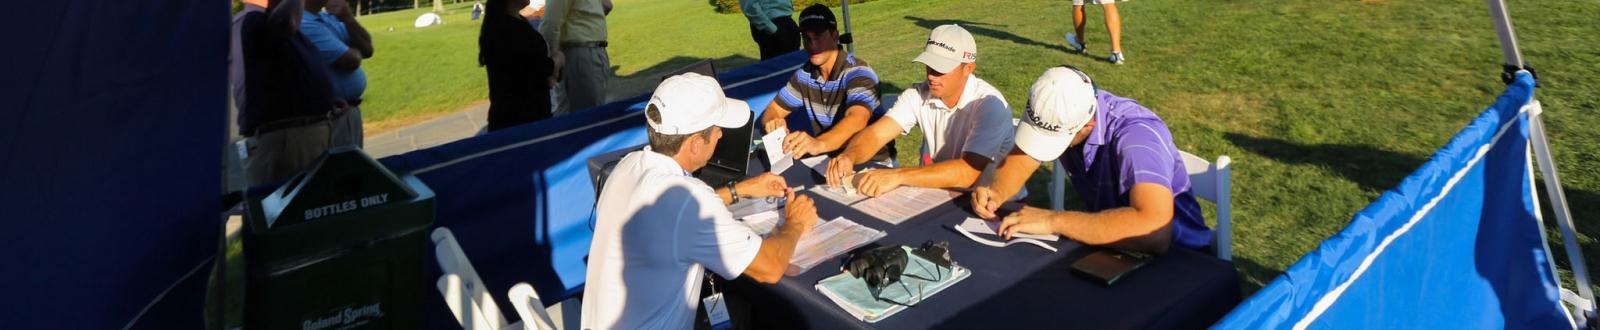 Golfers sitting in a scoring tent